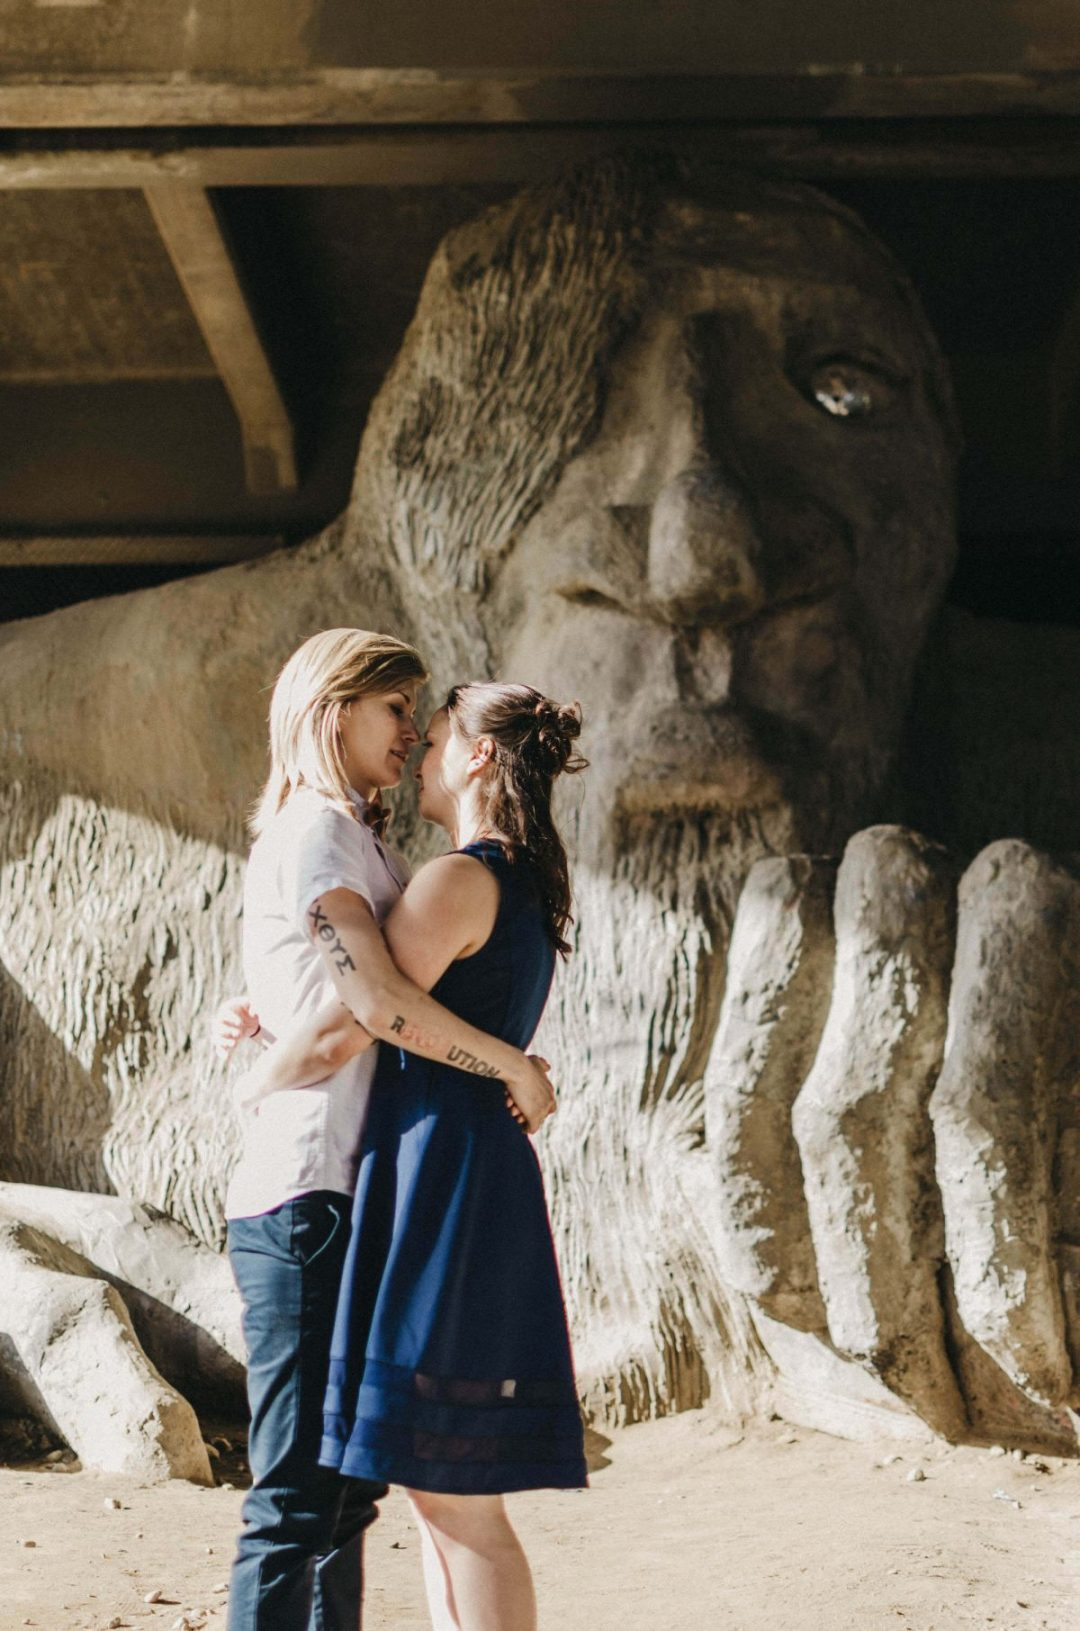 Fremont-Seattle-Wedding, Seattle-Wedding, Gay-Wedding, Gay-Wedding-Photography, Gay-Wedding-photos, seattle-wedding-photographer, Fremont-wedding-venue, lake-union-wedding,